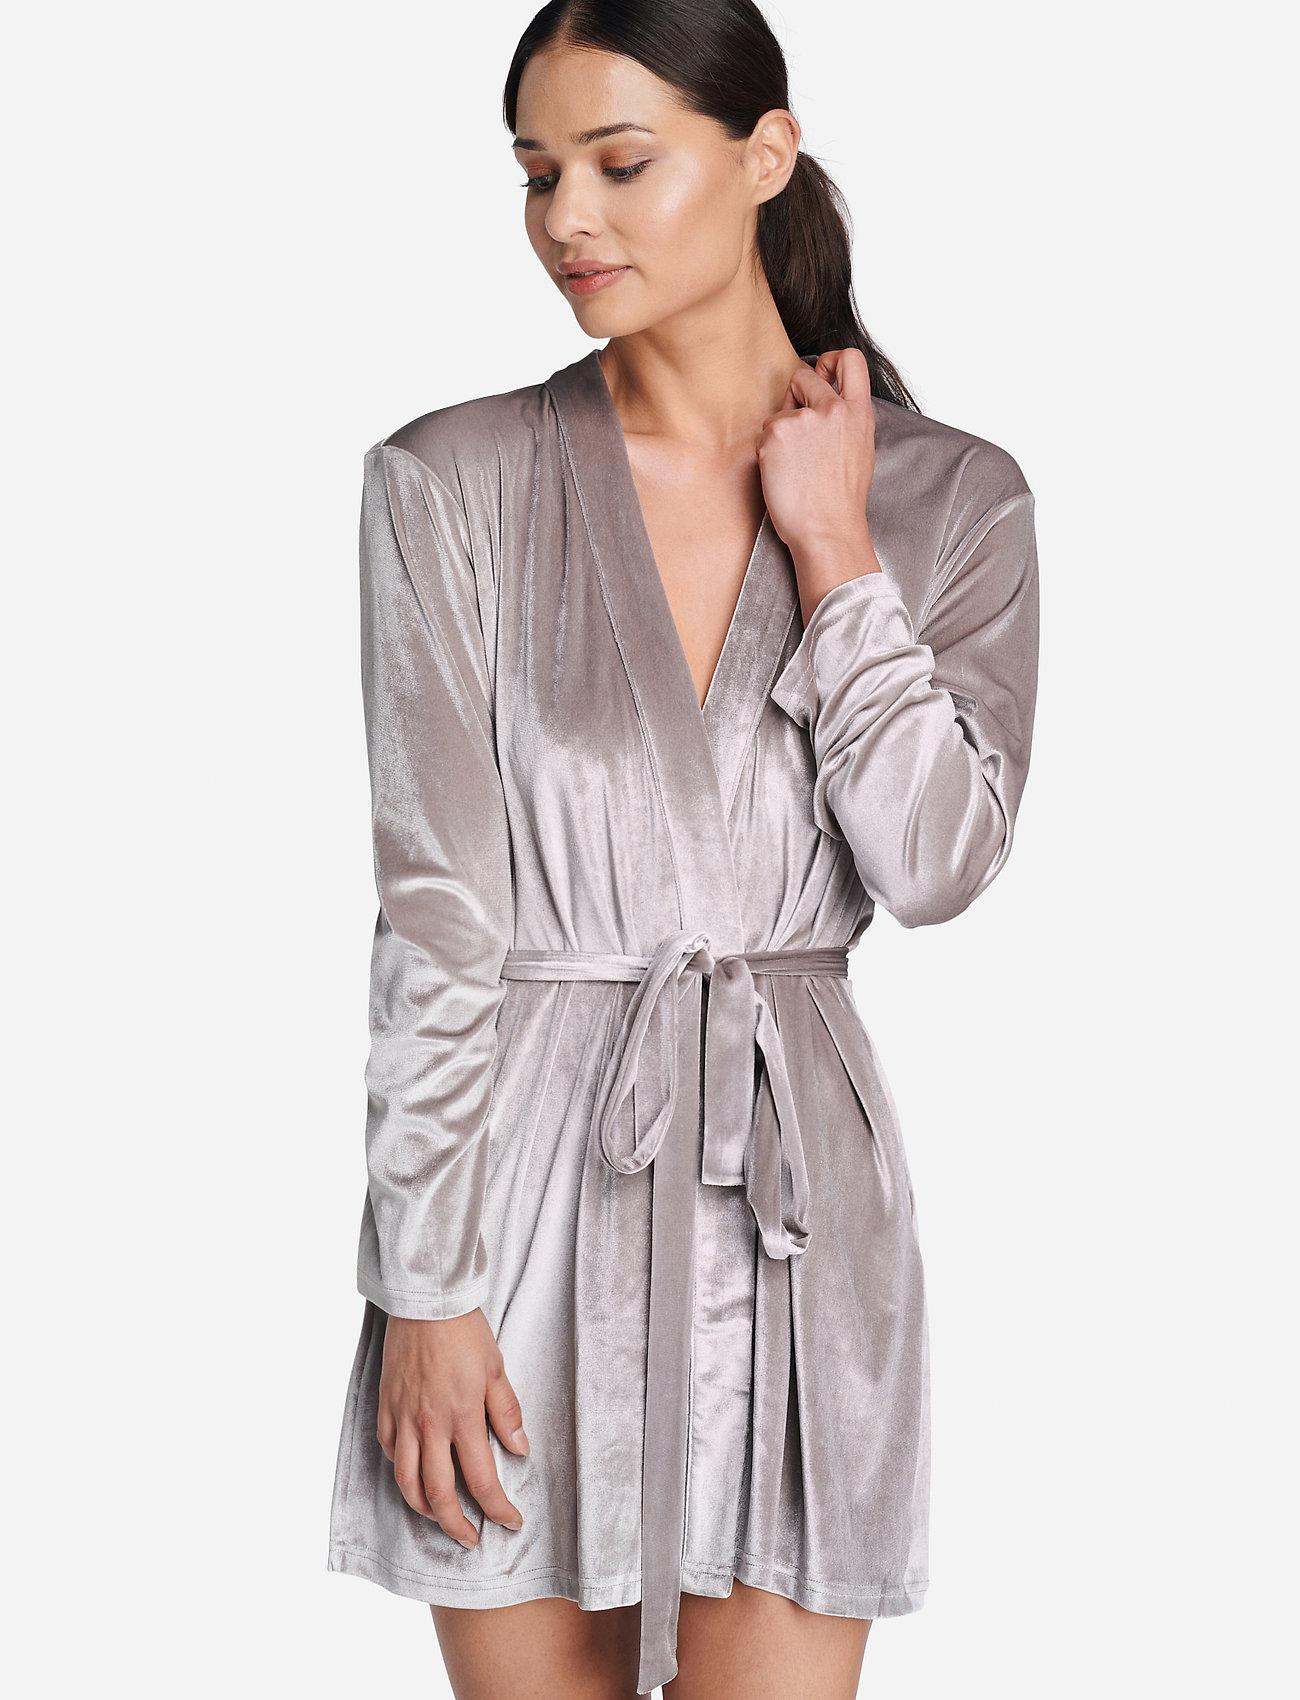 OW Intimates - KATRINA Short Robe - pegnoirs - grey - 0